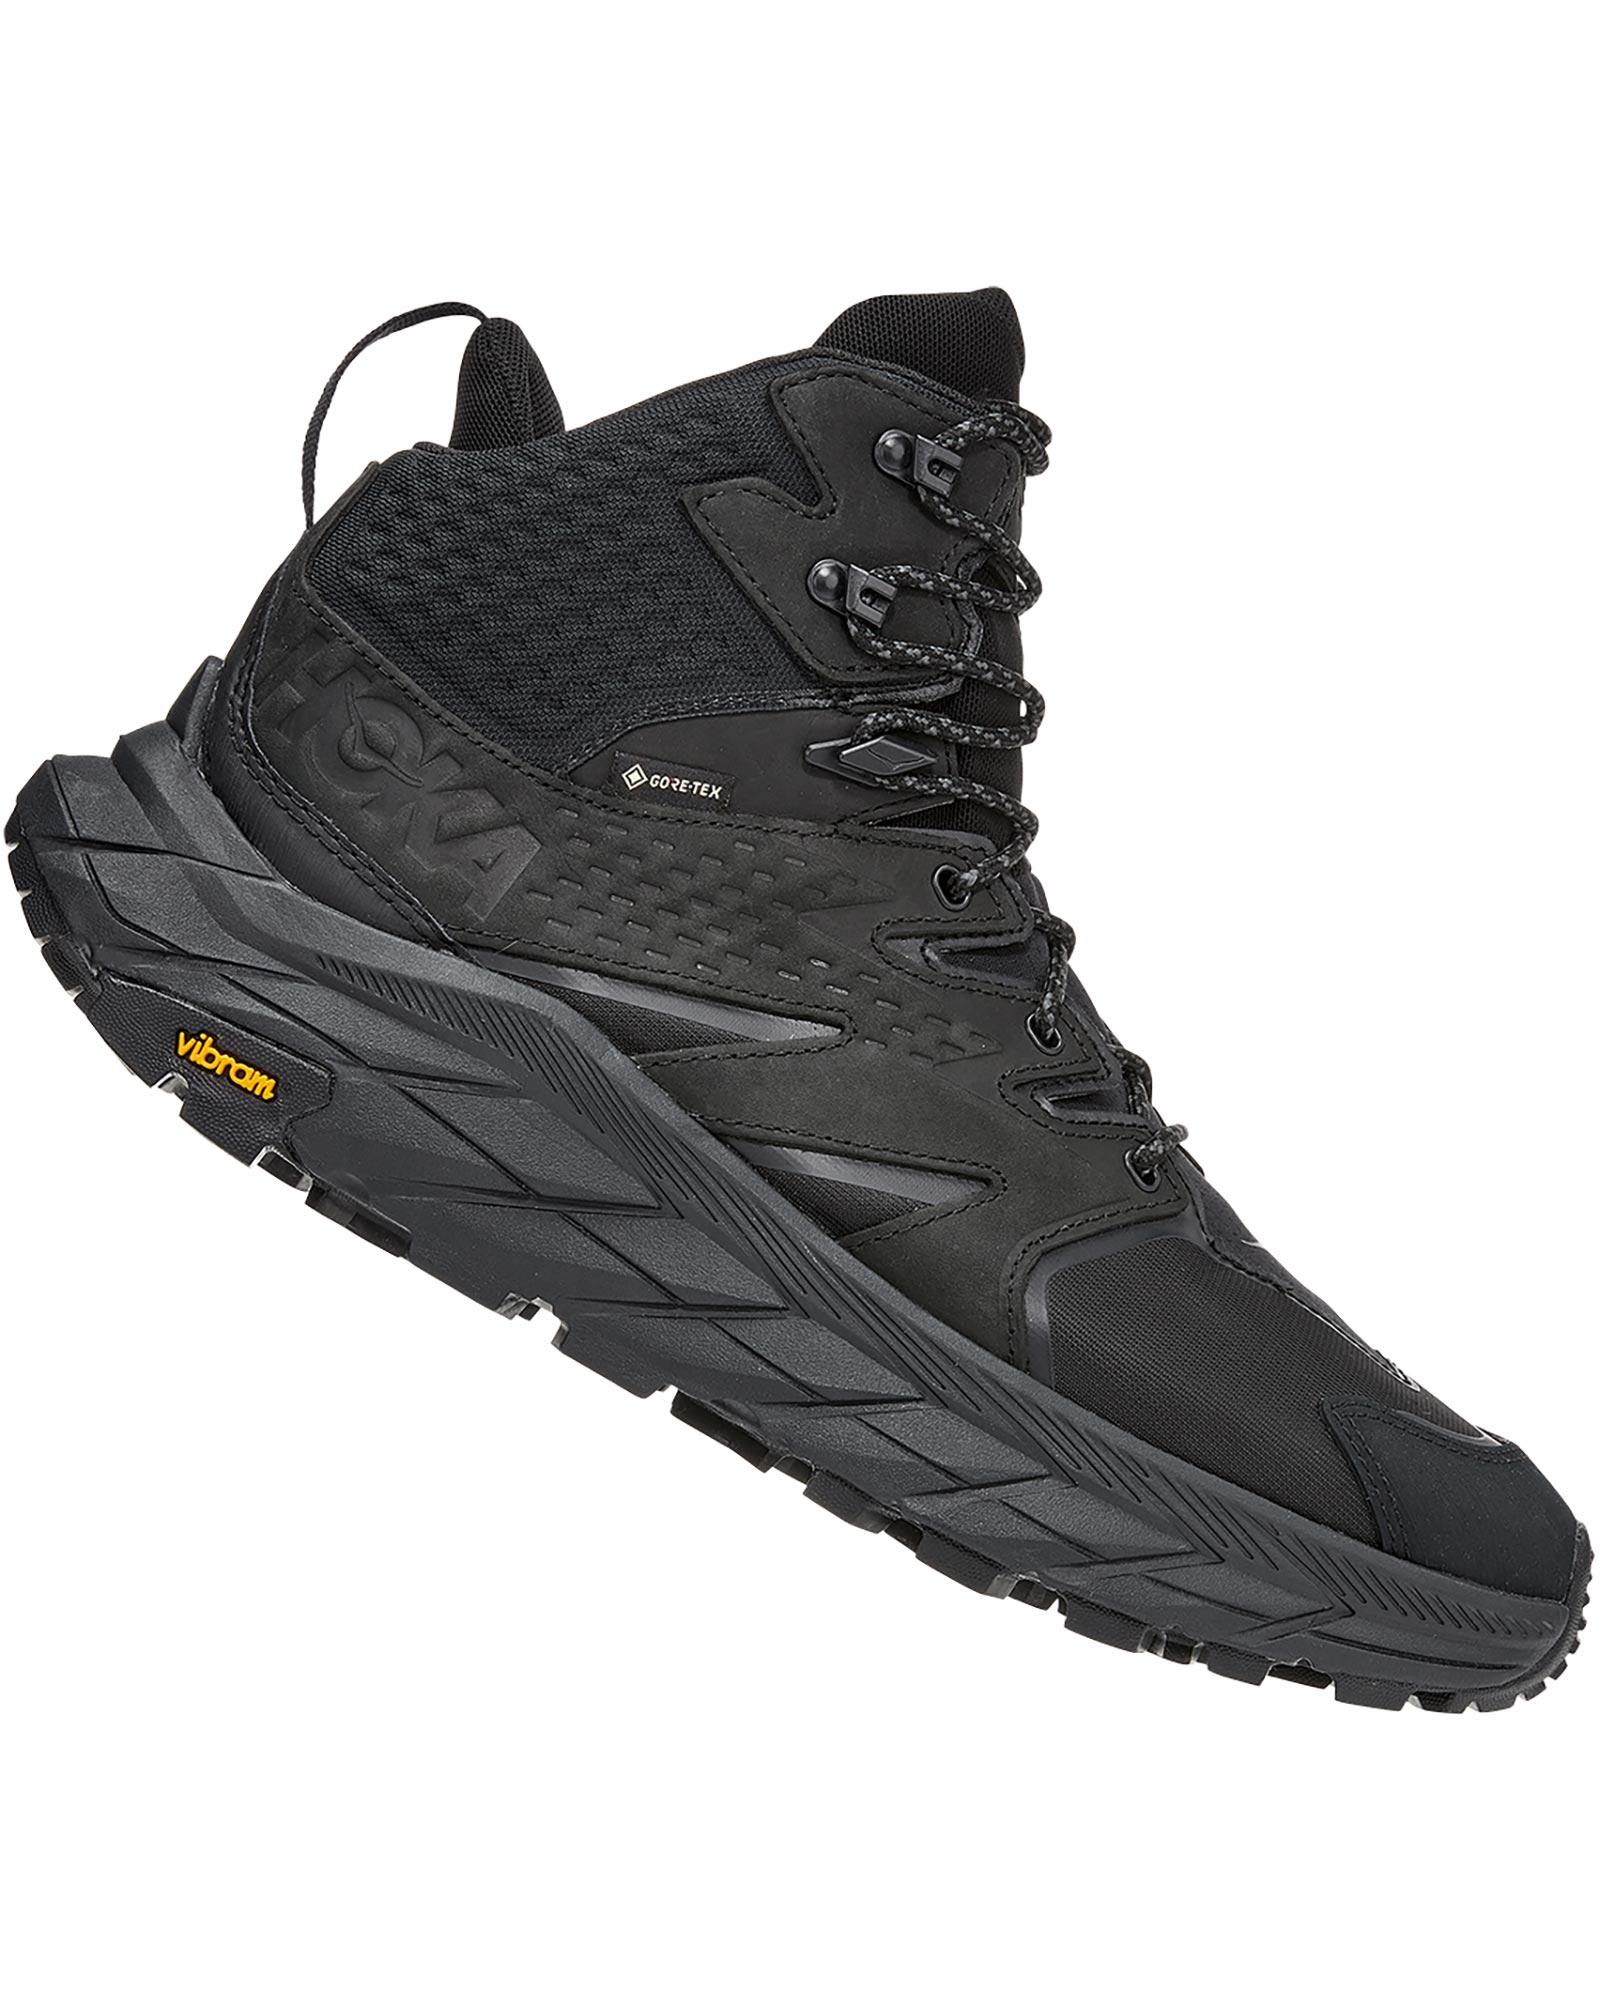 Trekking & Outdoor Hoka One One Anacapa Mid GORe-TeX Men's Boots